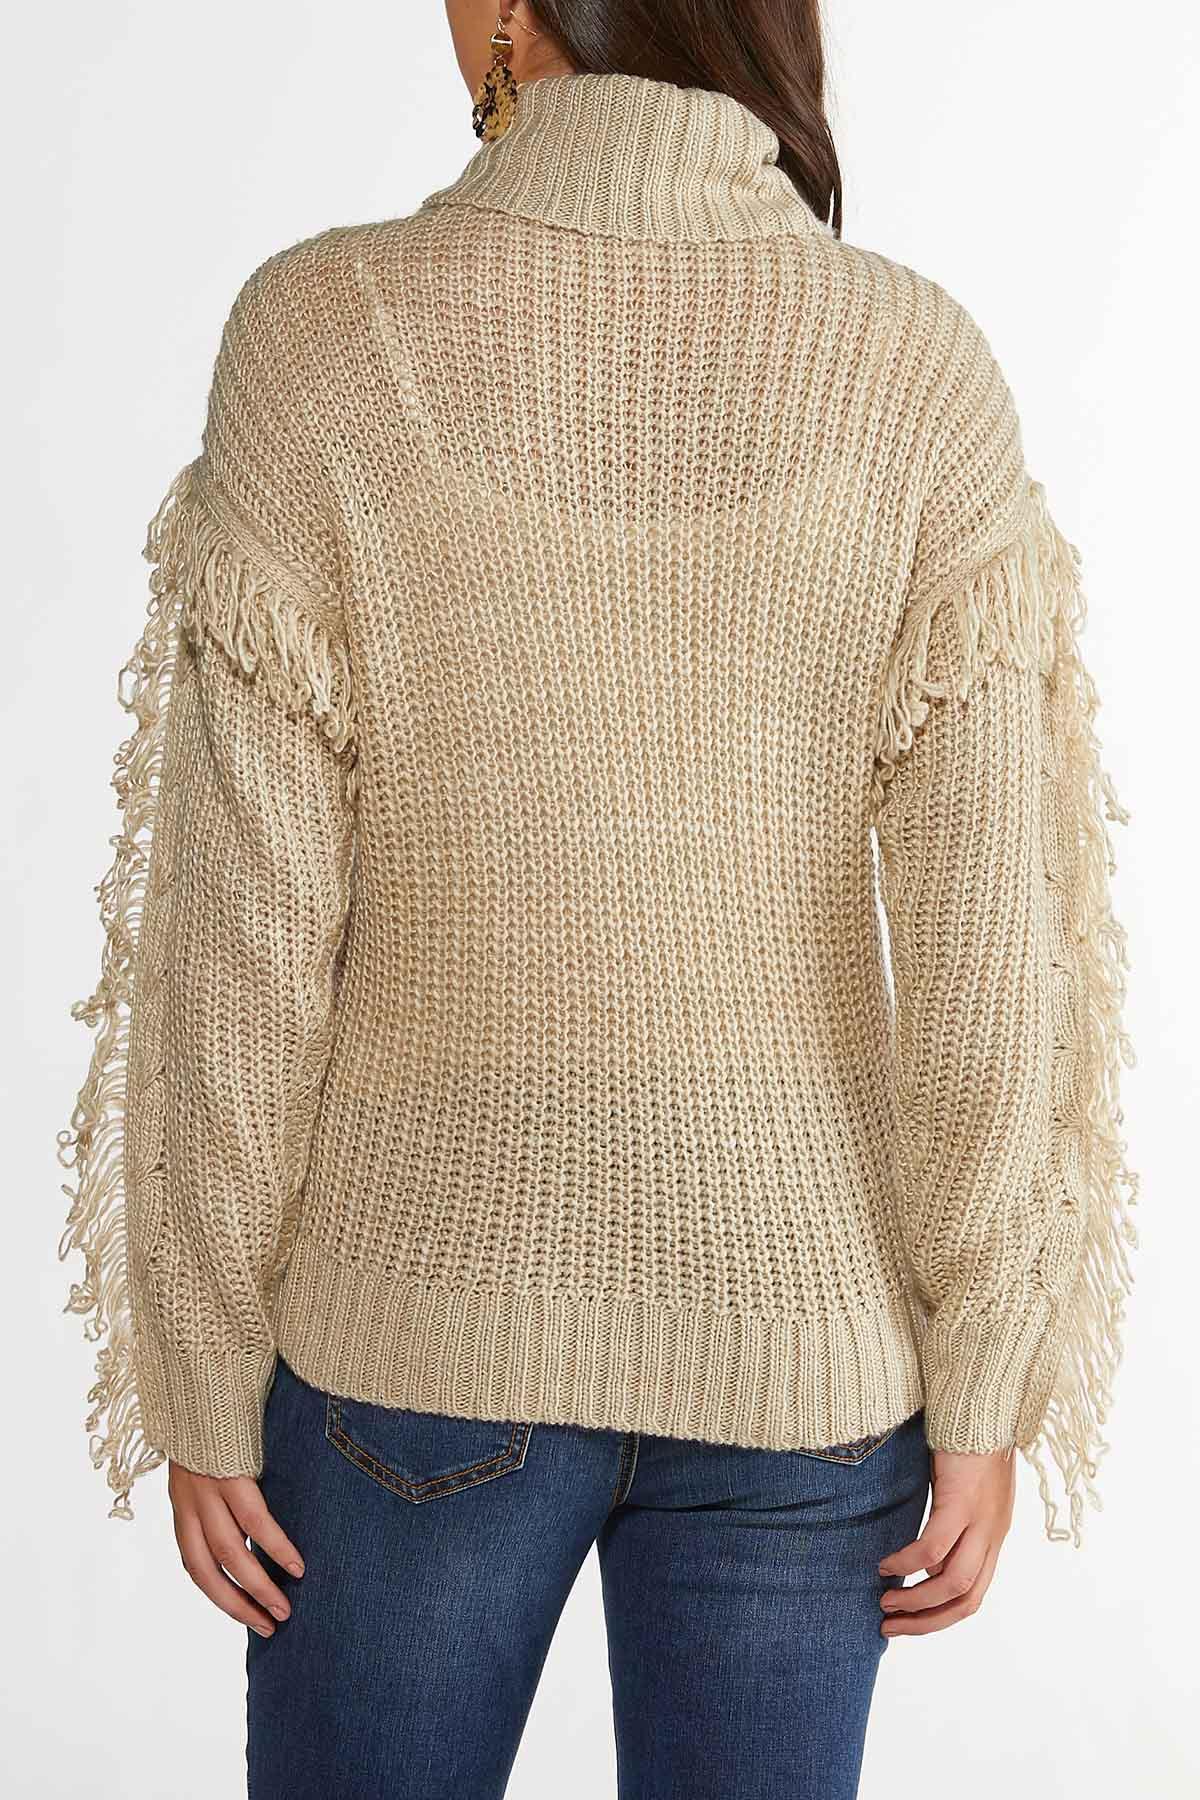 Fringe Turtleneck Sweater (Item #44406289)